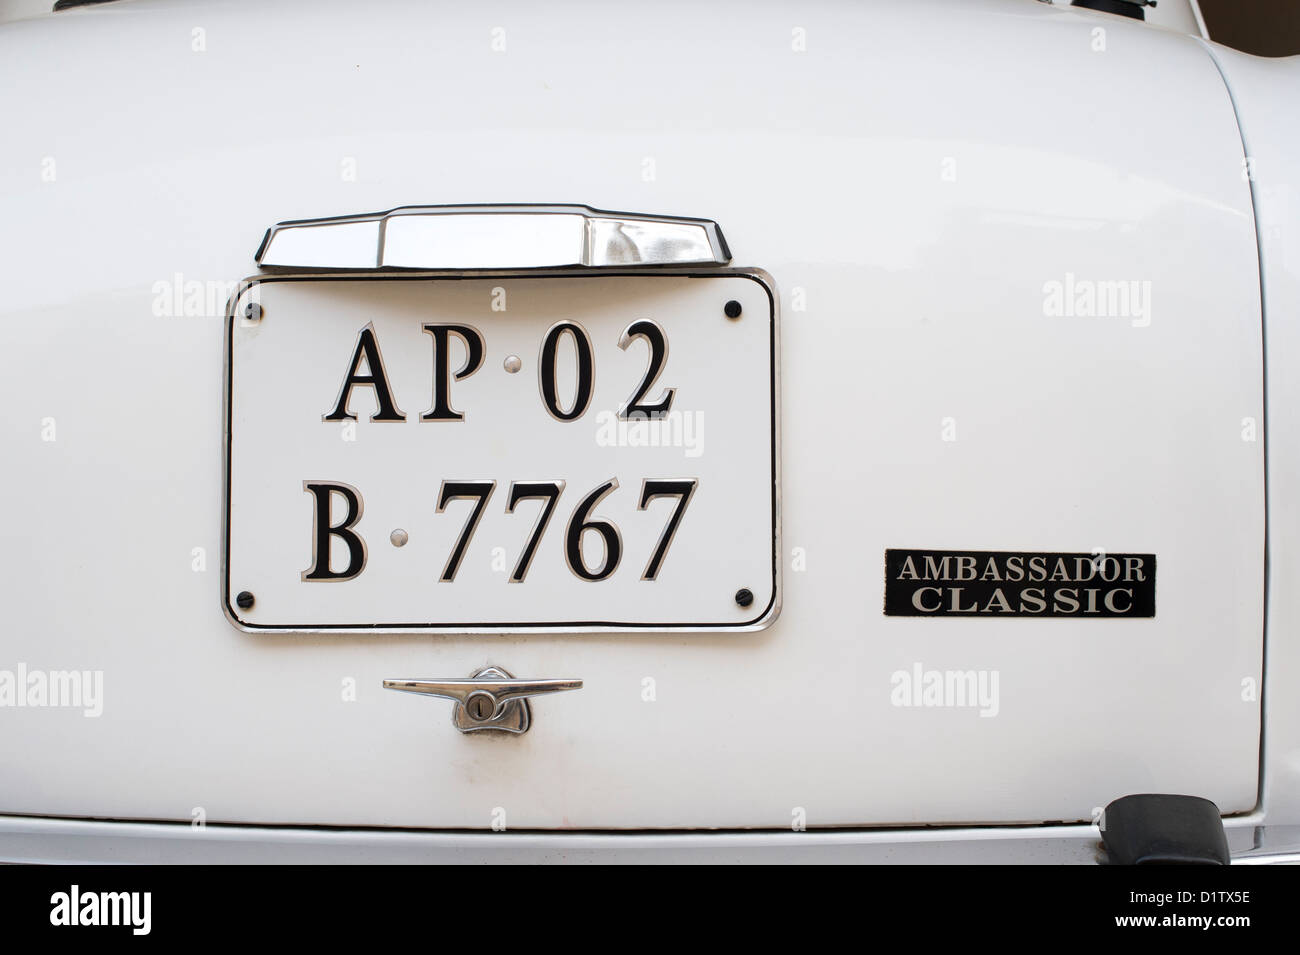 Hindustan Ambassador Classic indian car. Rear End - Stock Image